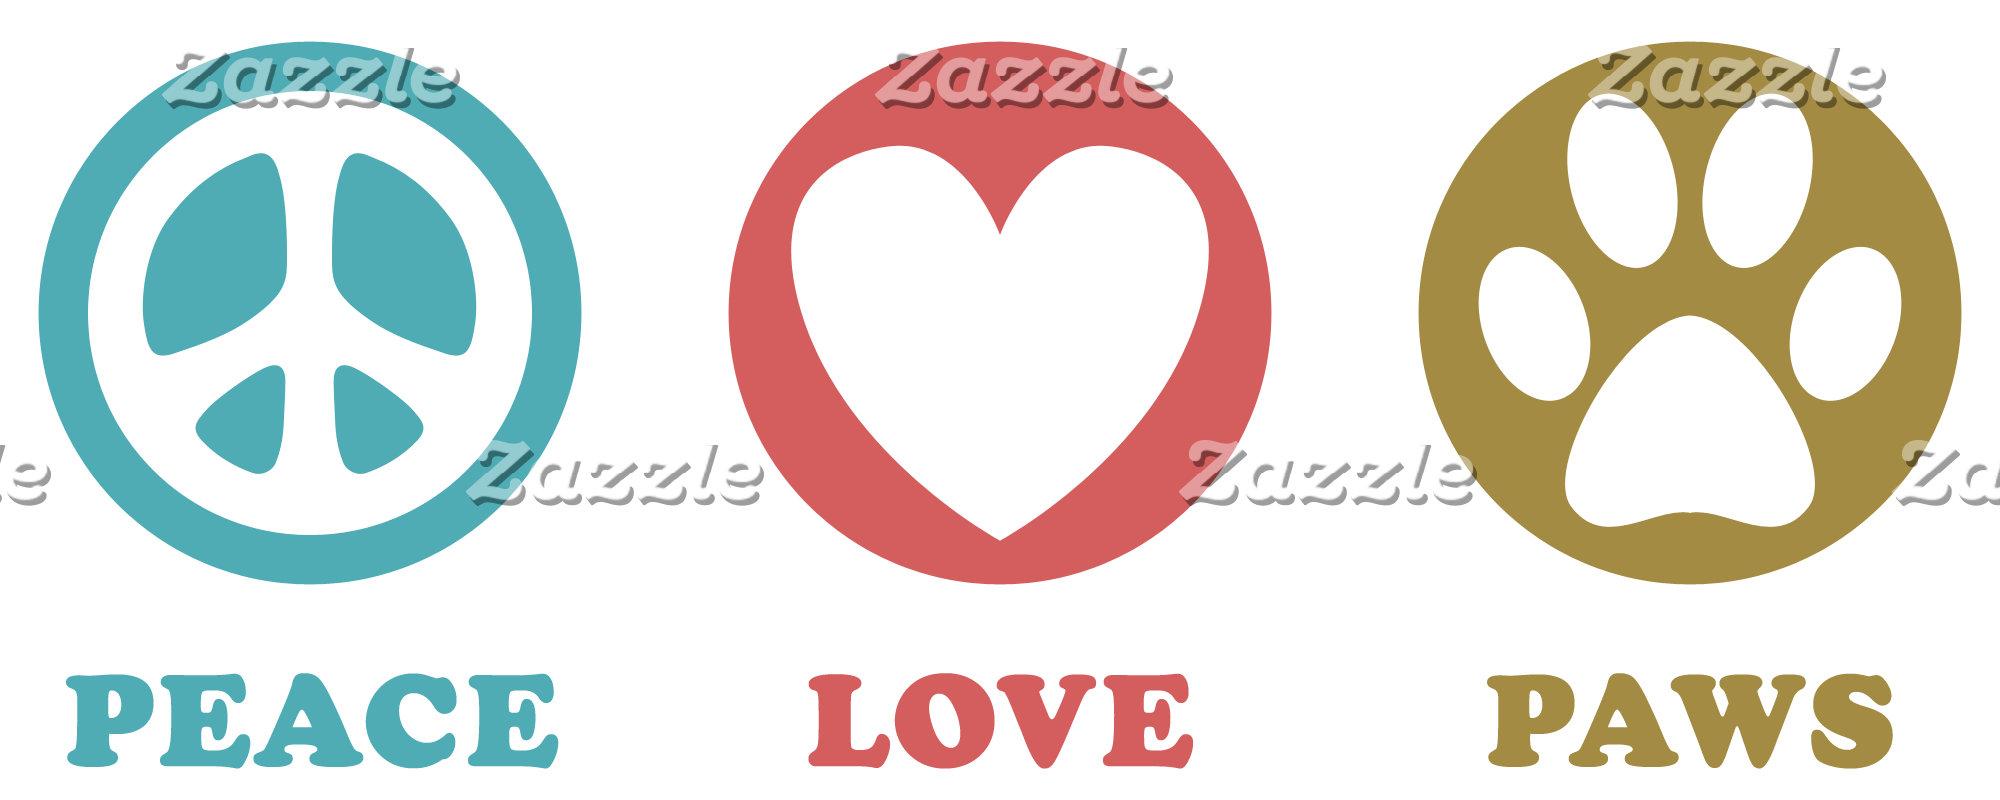 Peace Love Paws